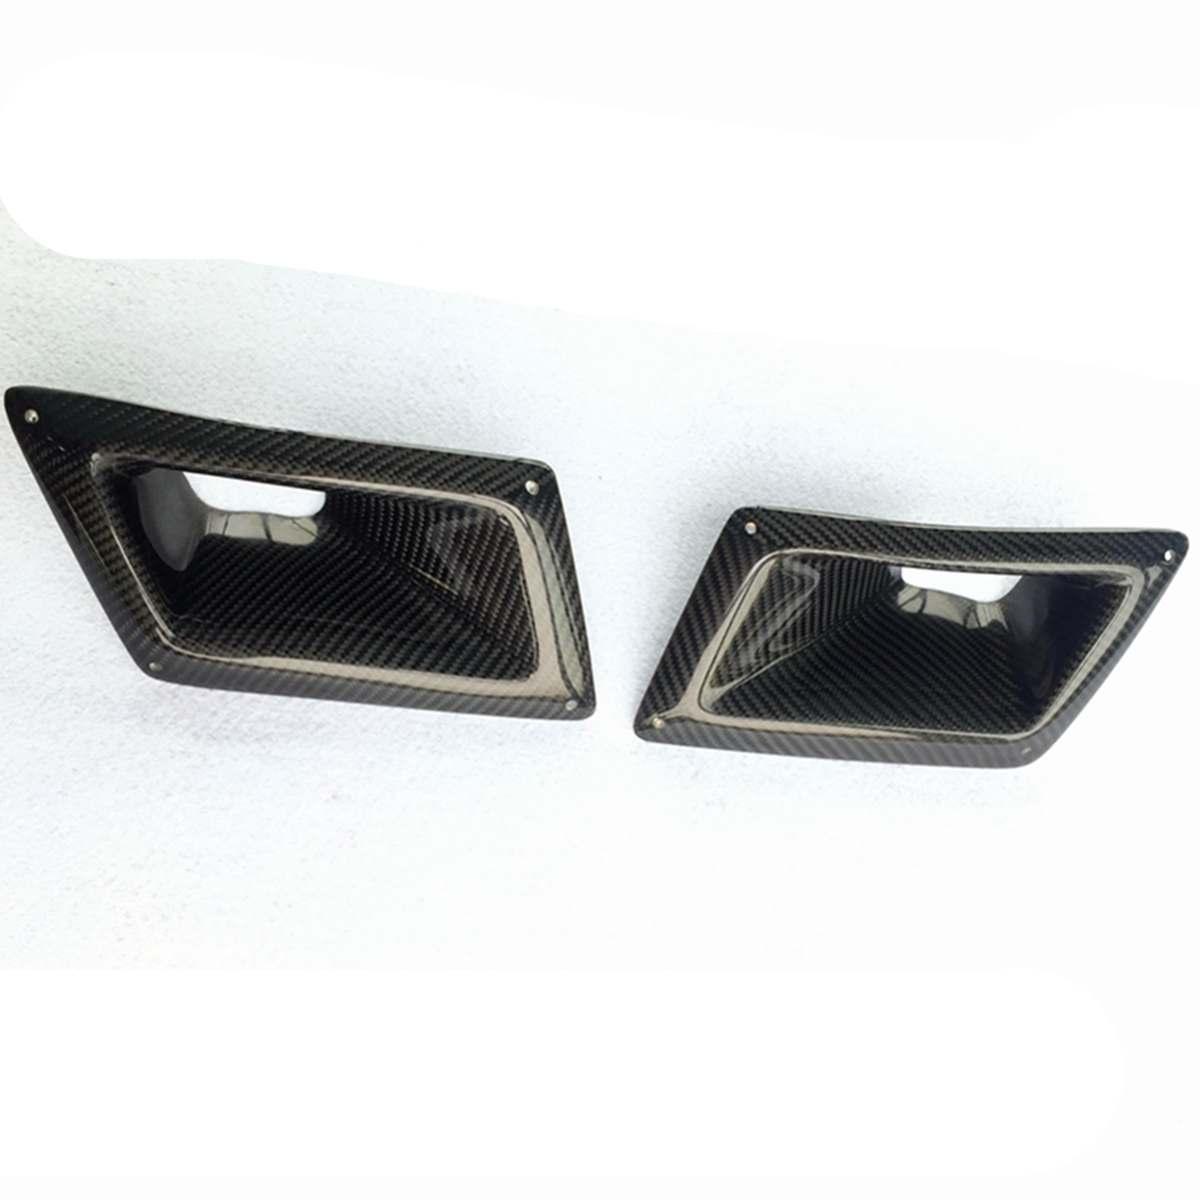 For Nissan 350Z Z33 2003-09 Real Carbon Fiber Air Vent Intake Duct Left Side